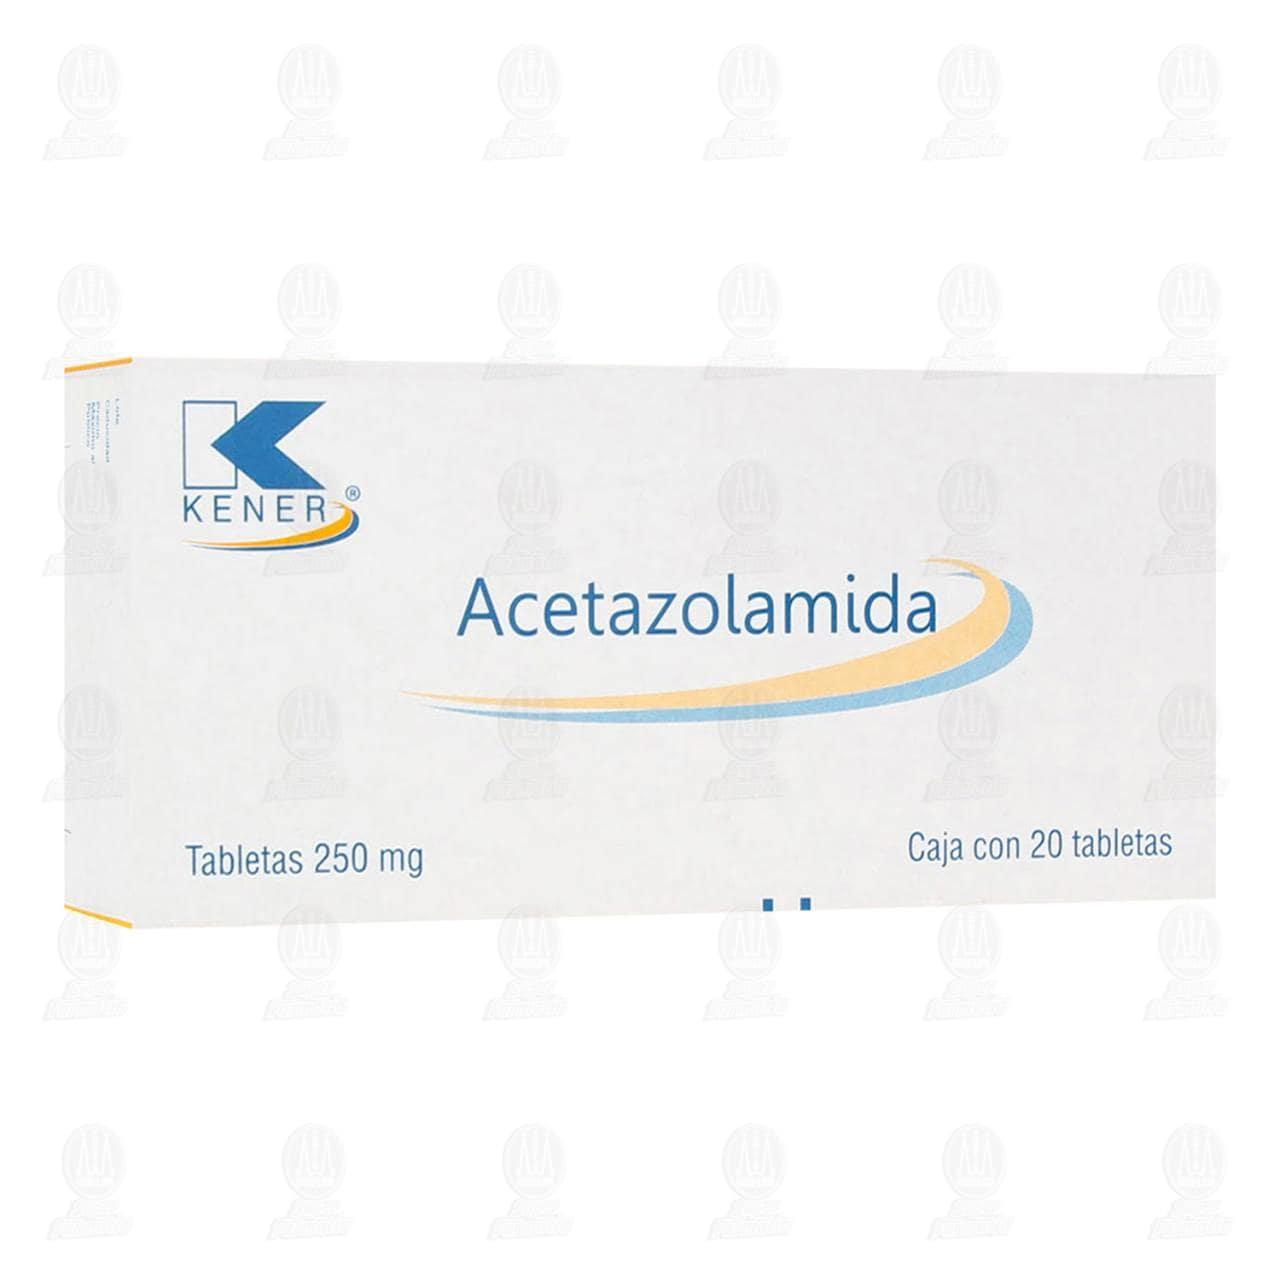 Acetazolamida 250 mg 20 Tabletas Kener.